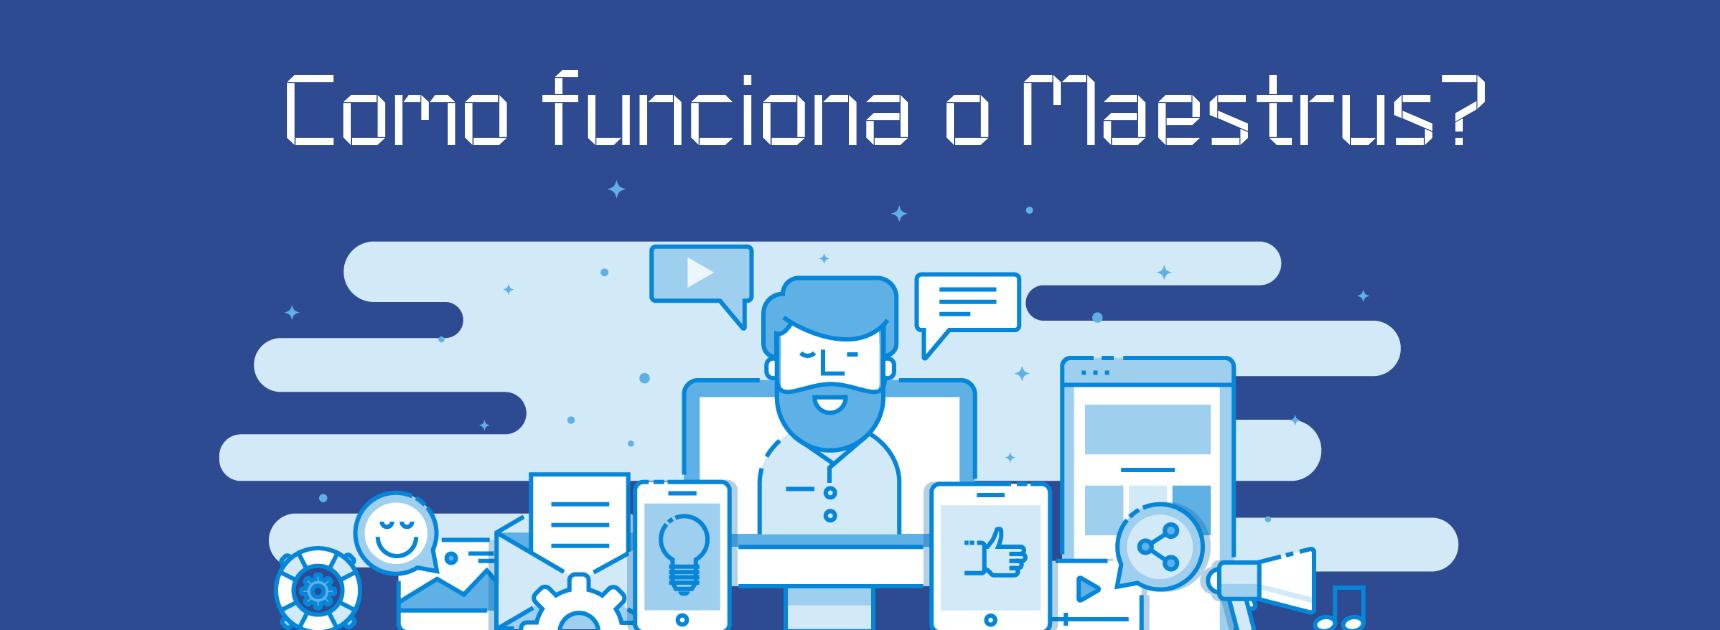 Como funciona a Plataforma Maestrus?